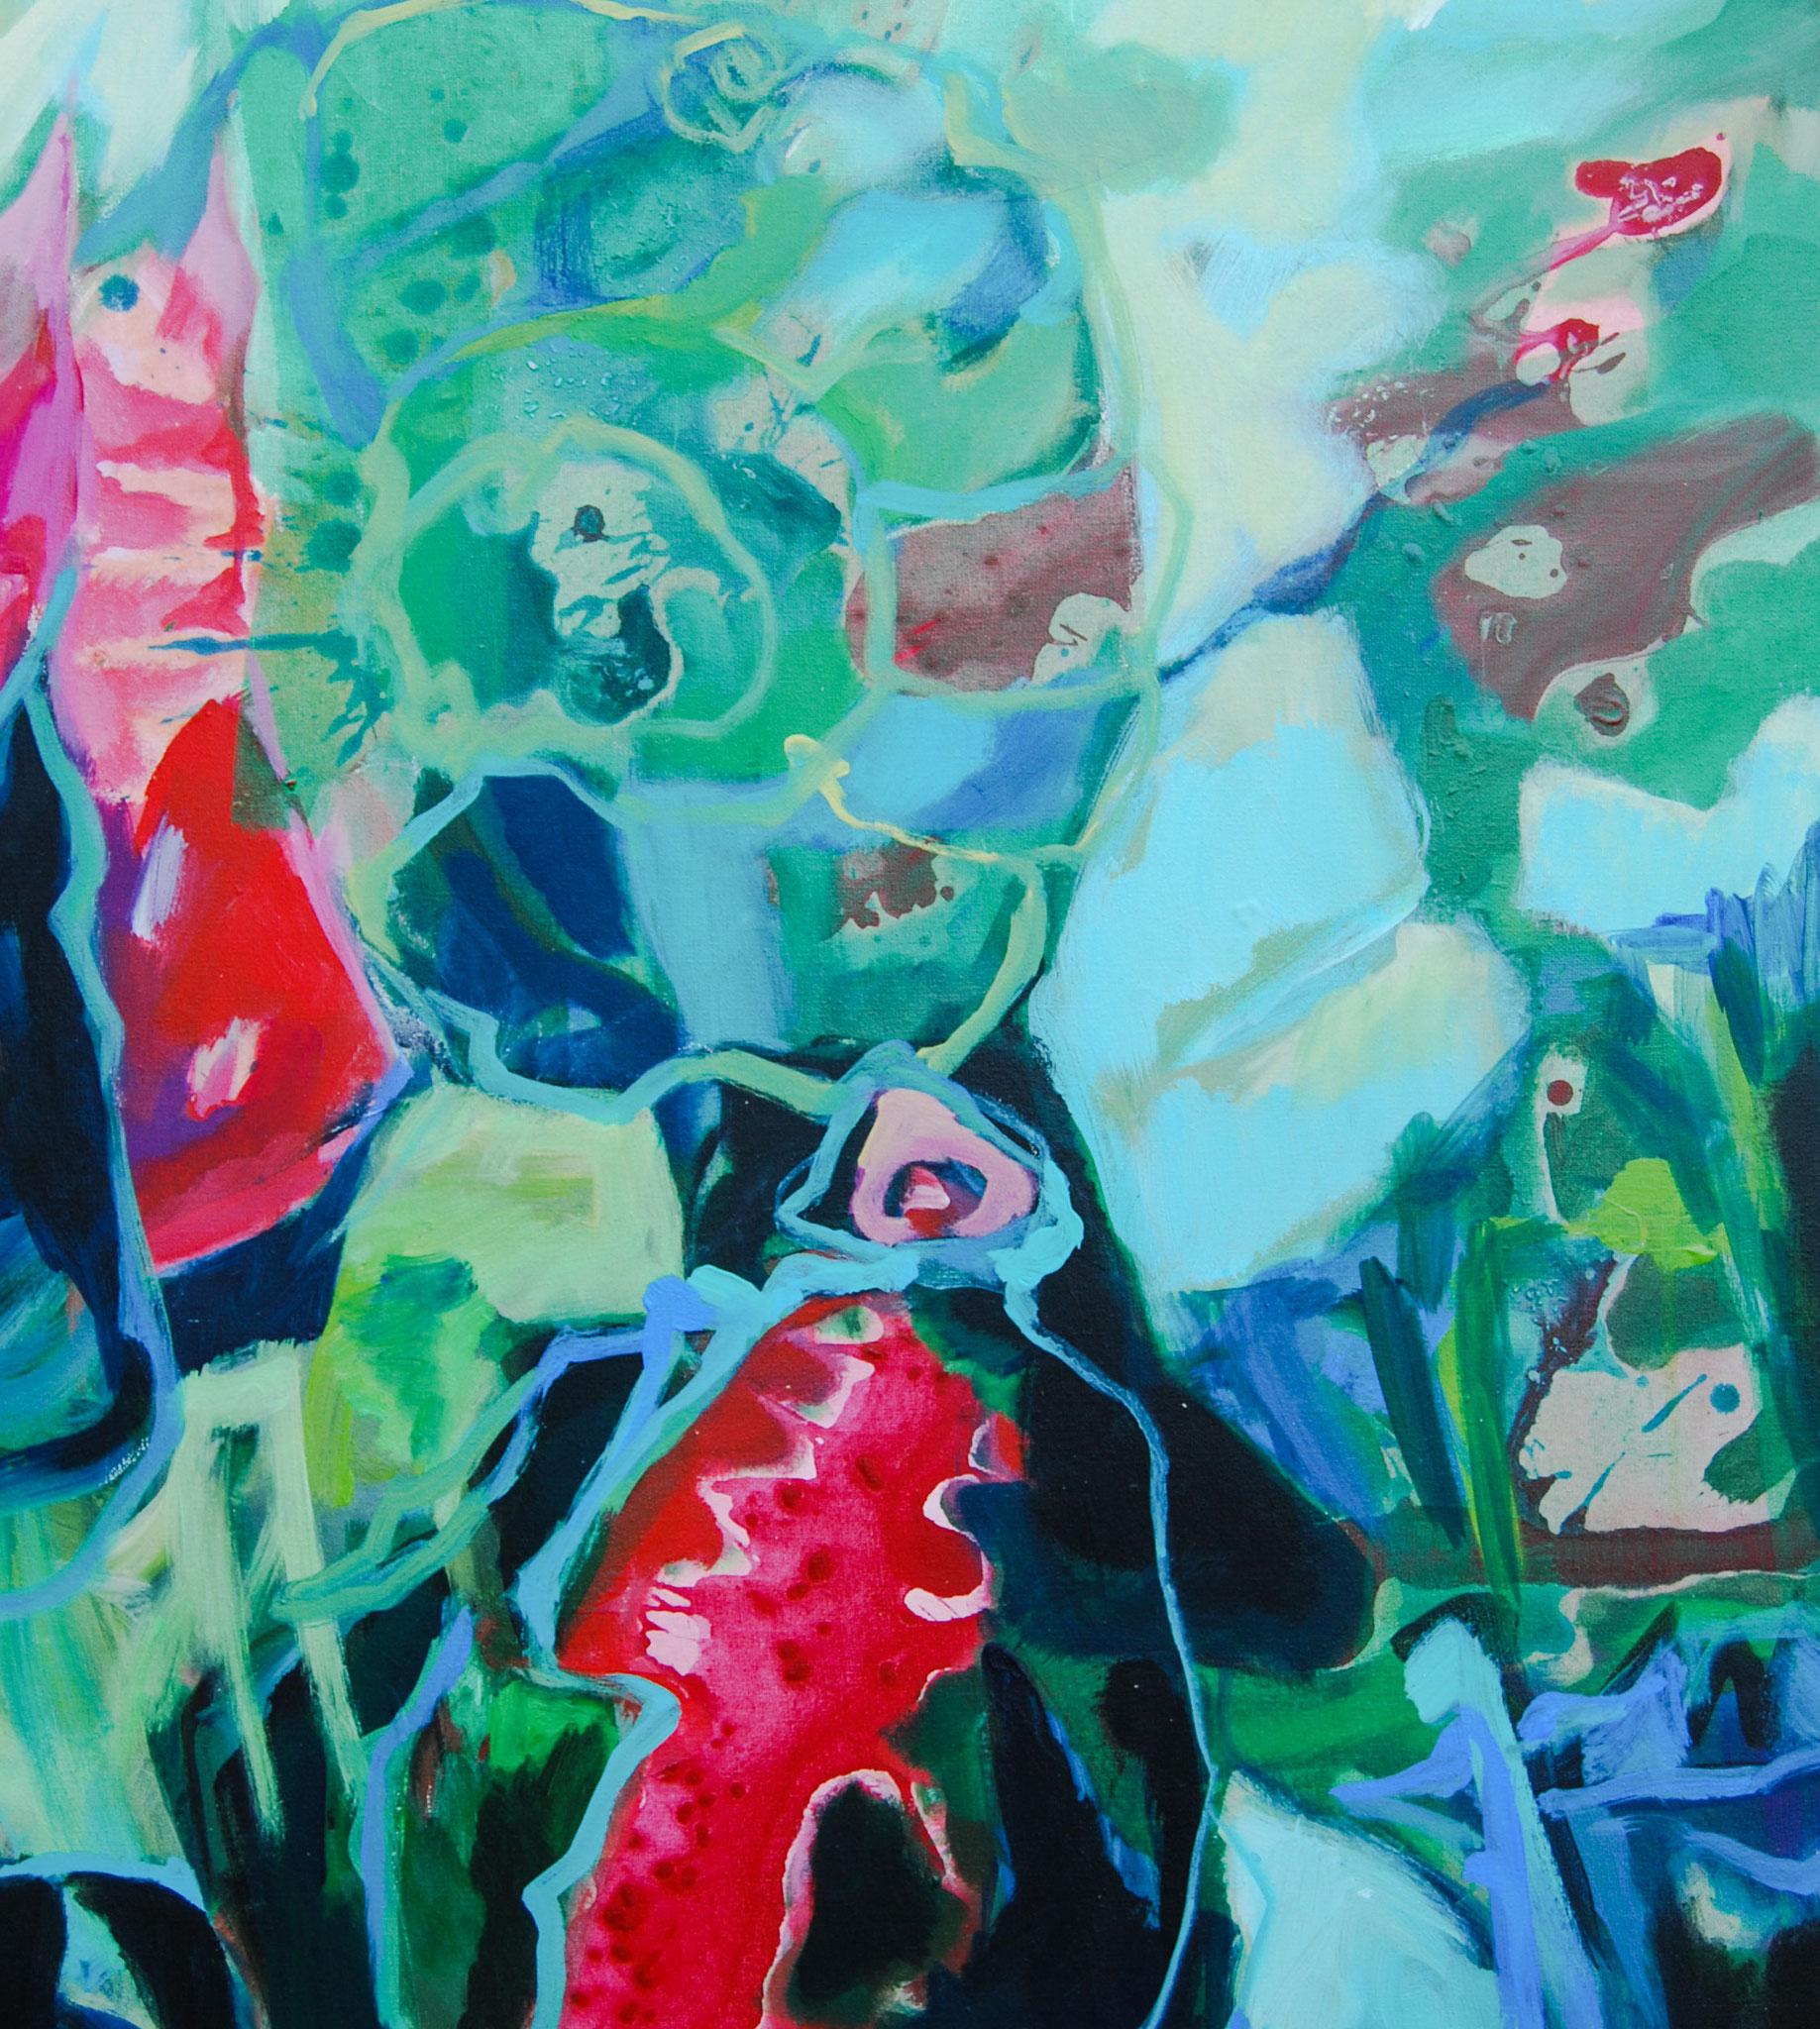 Garden Eden (1v6), 2018, Mischtechnik, 80 x 60 cm